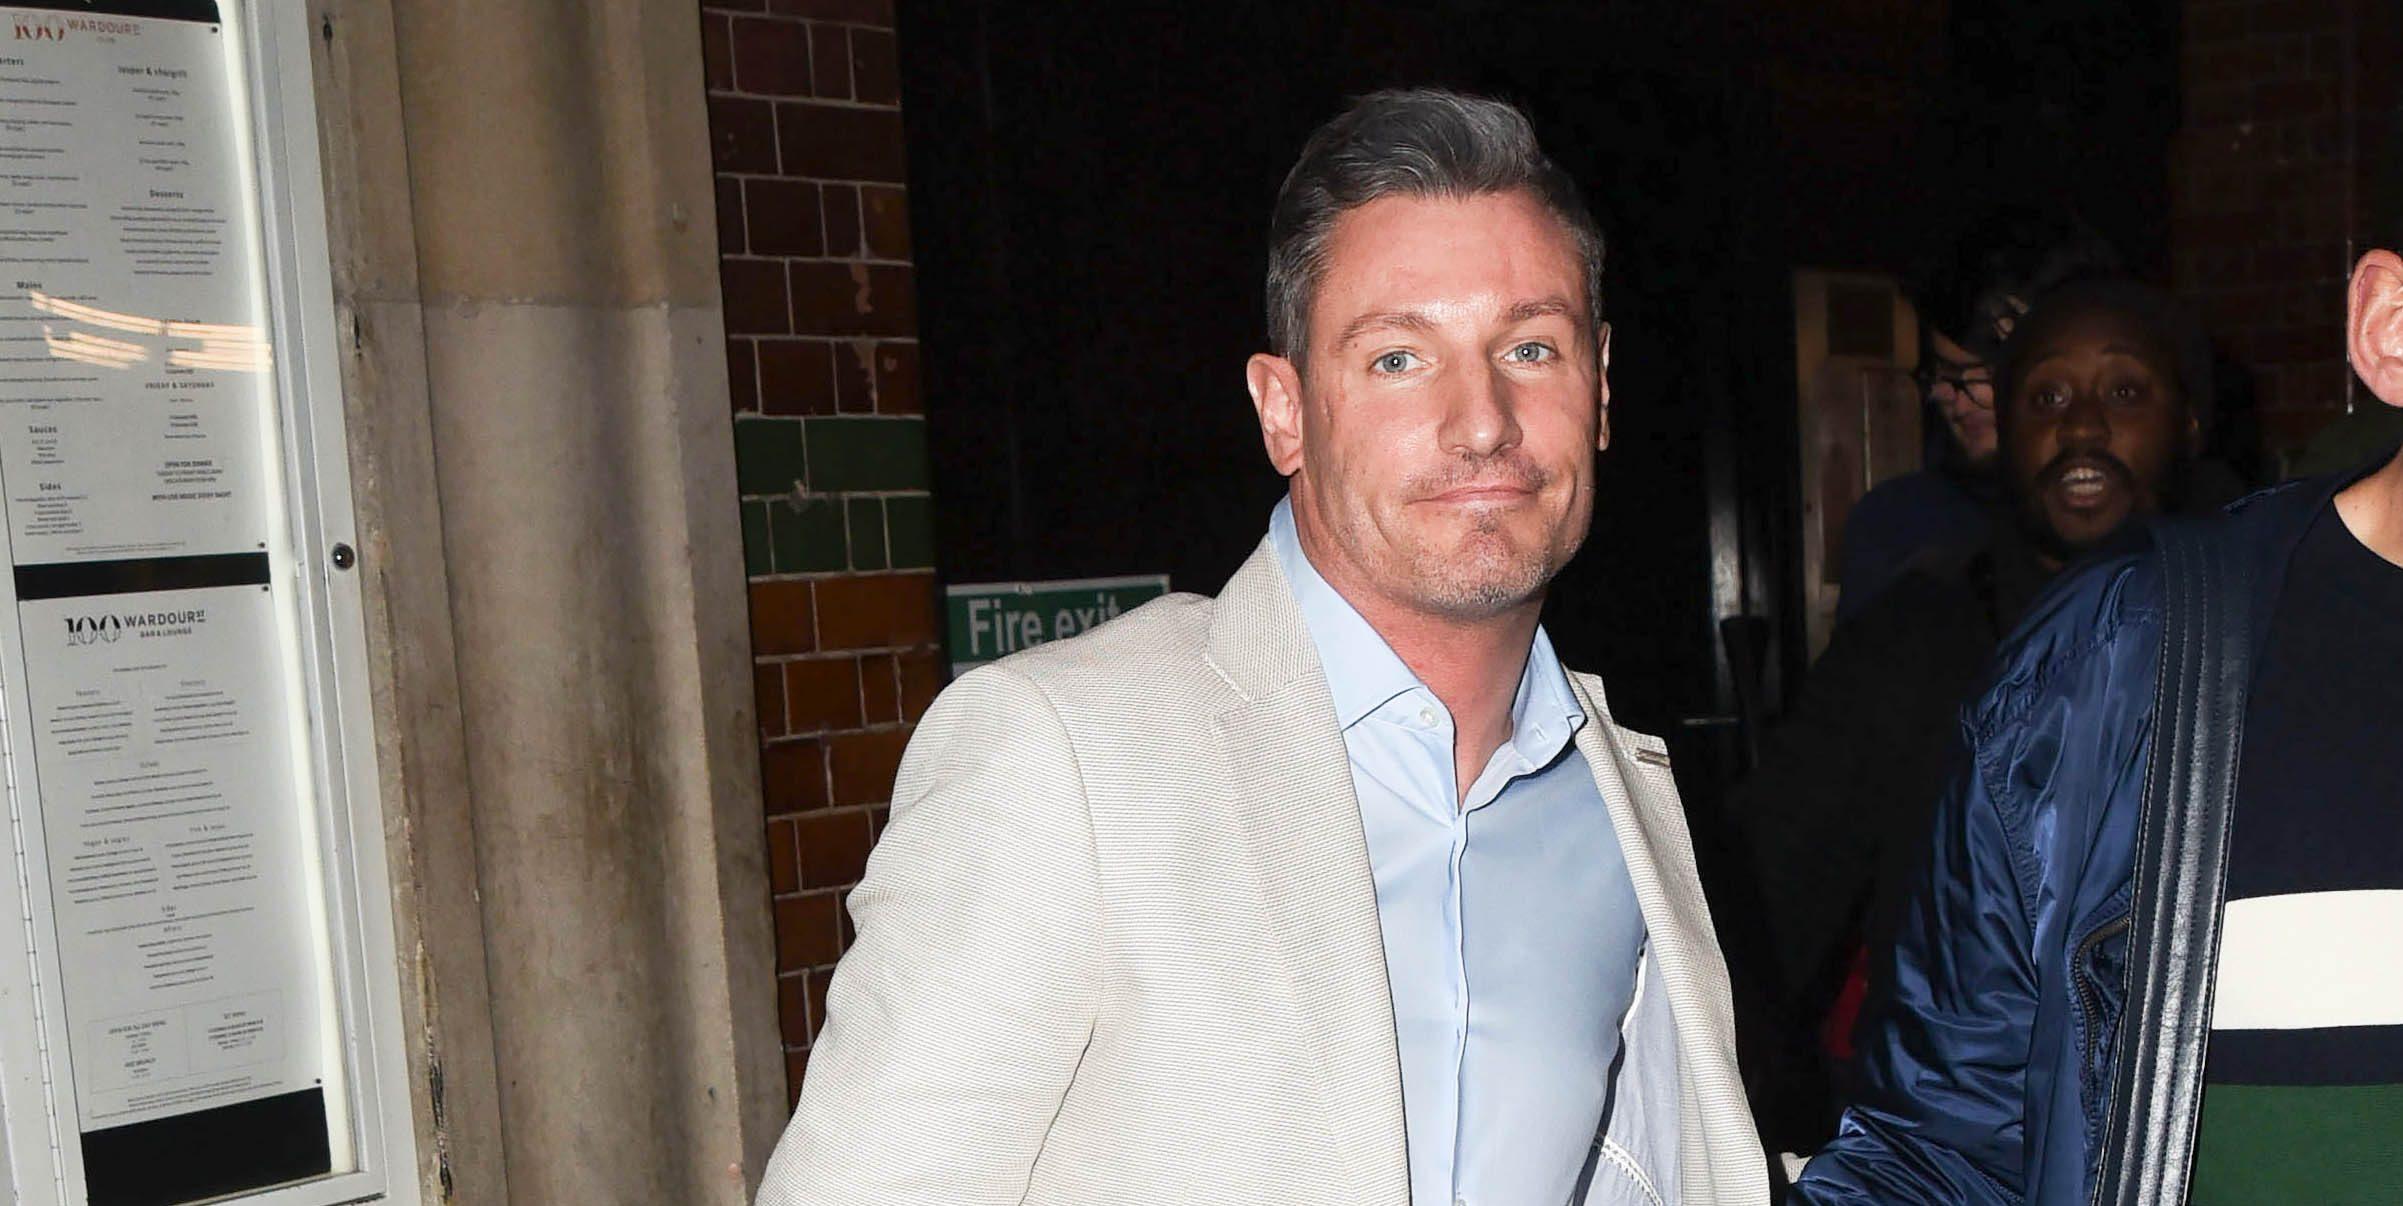 EastEnders' Dean Gaffney 'signs up' for Celebs Go Dating